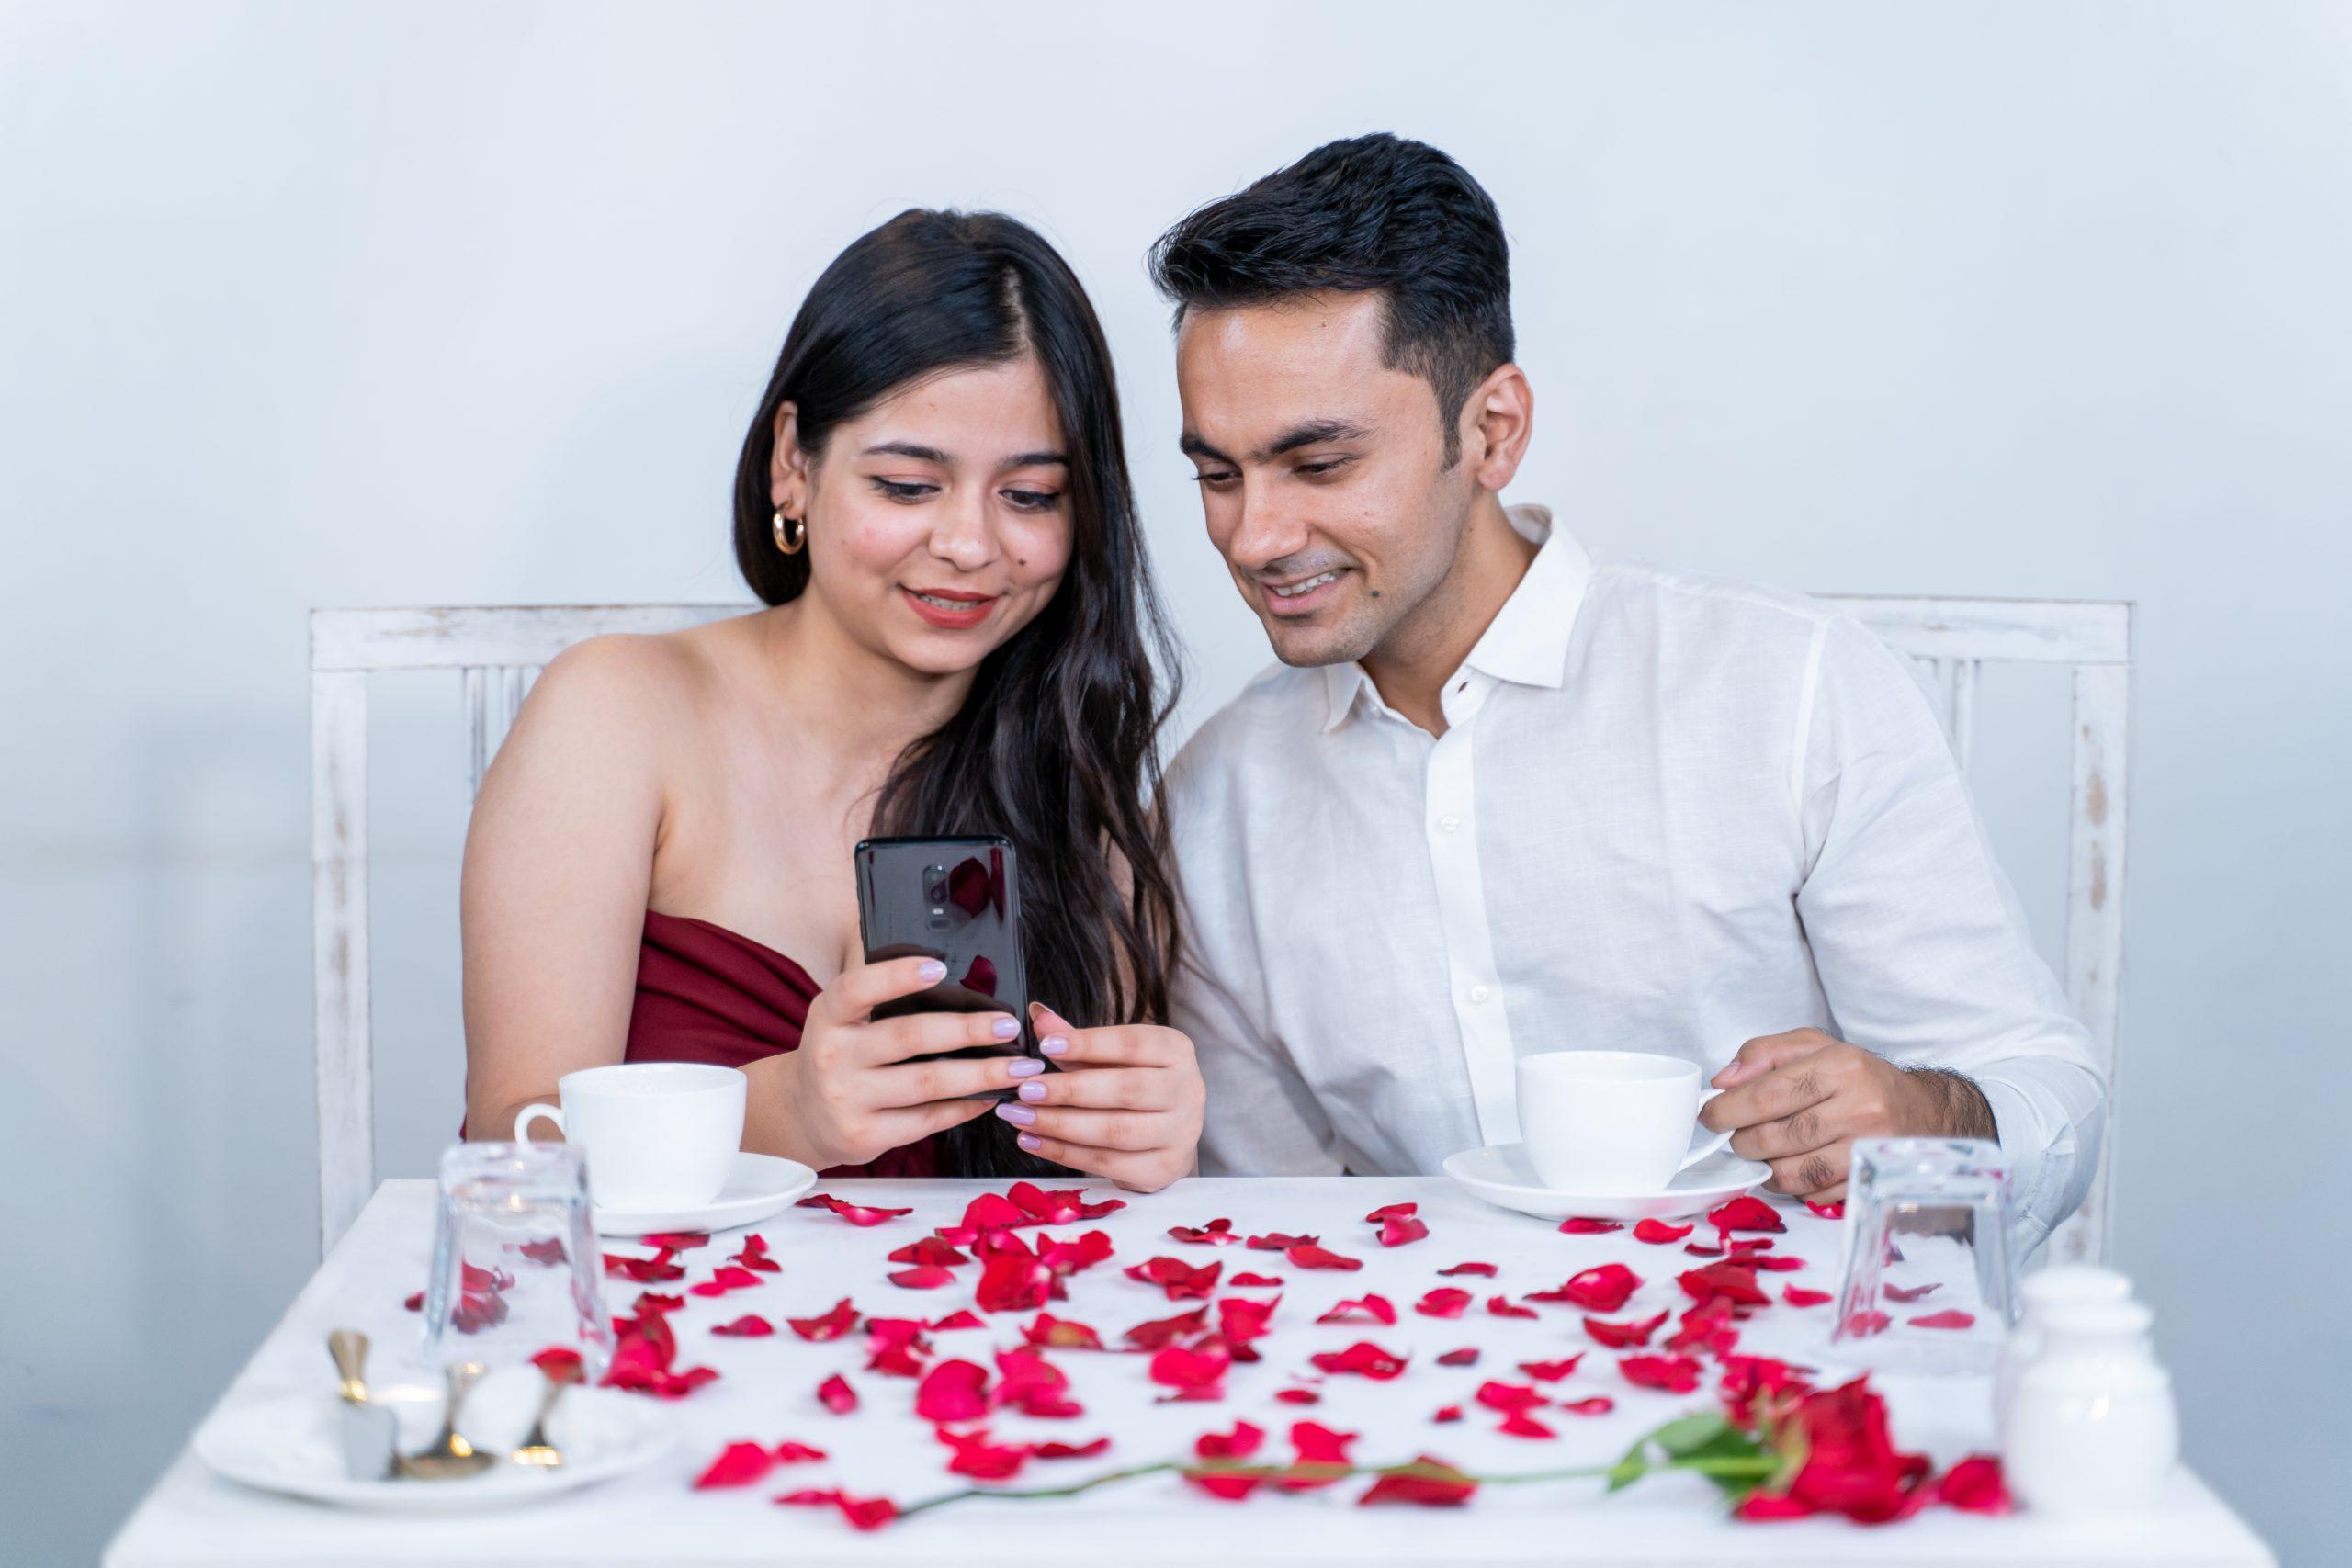 Couple enjoying on a date.